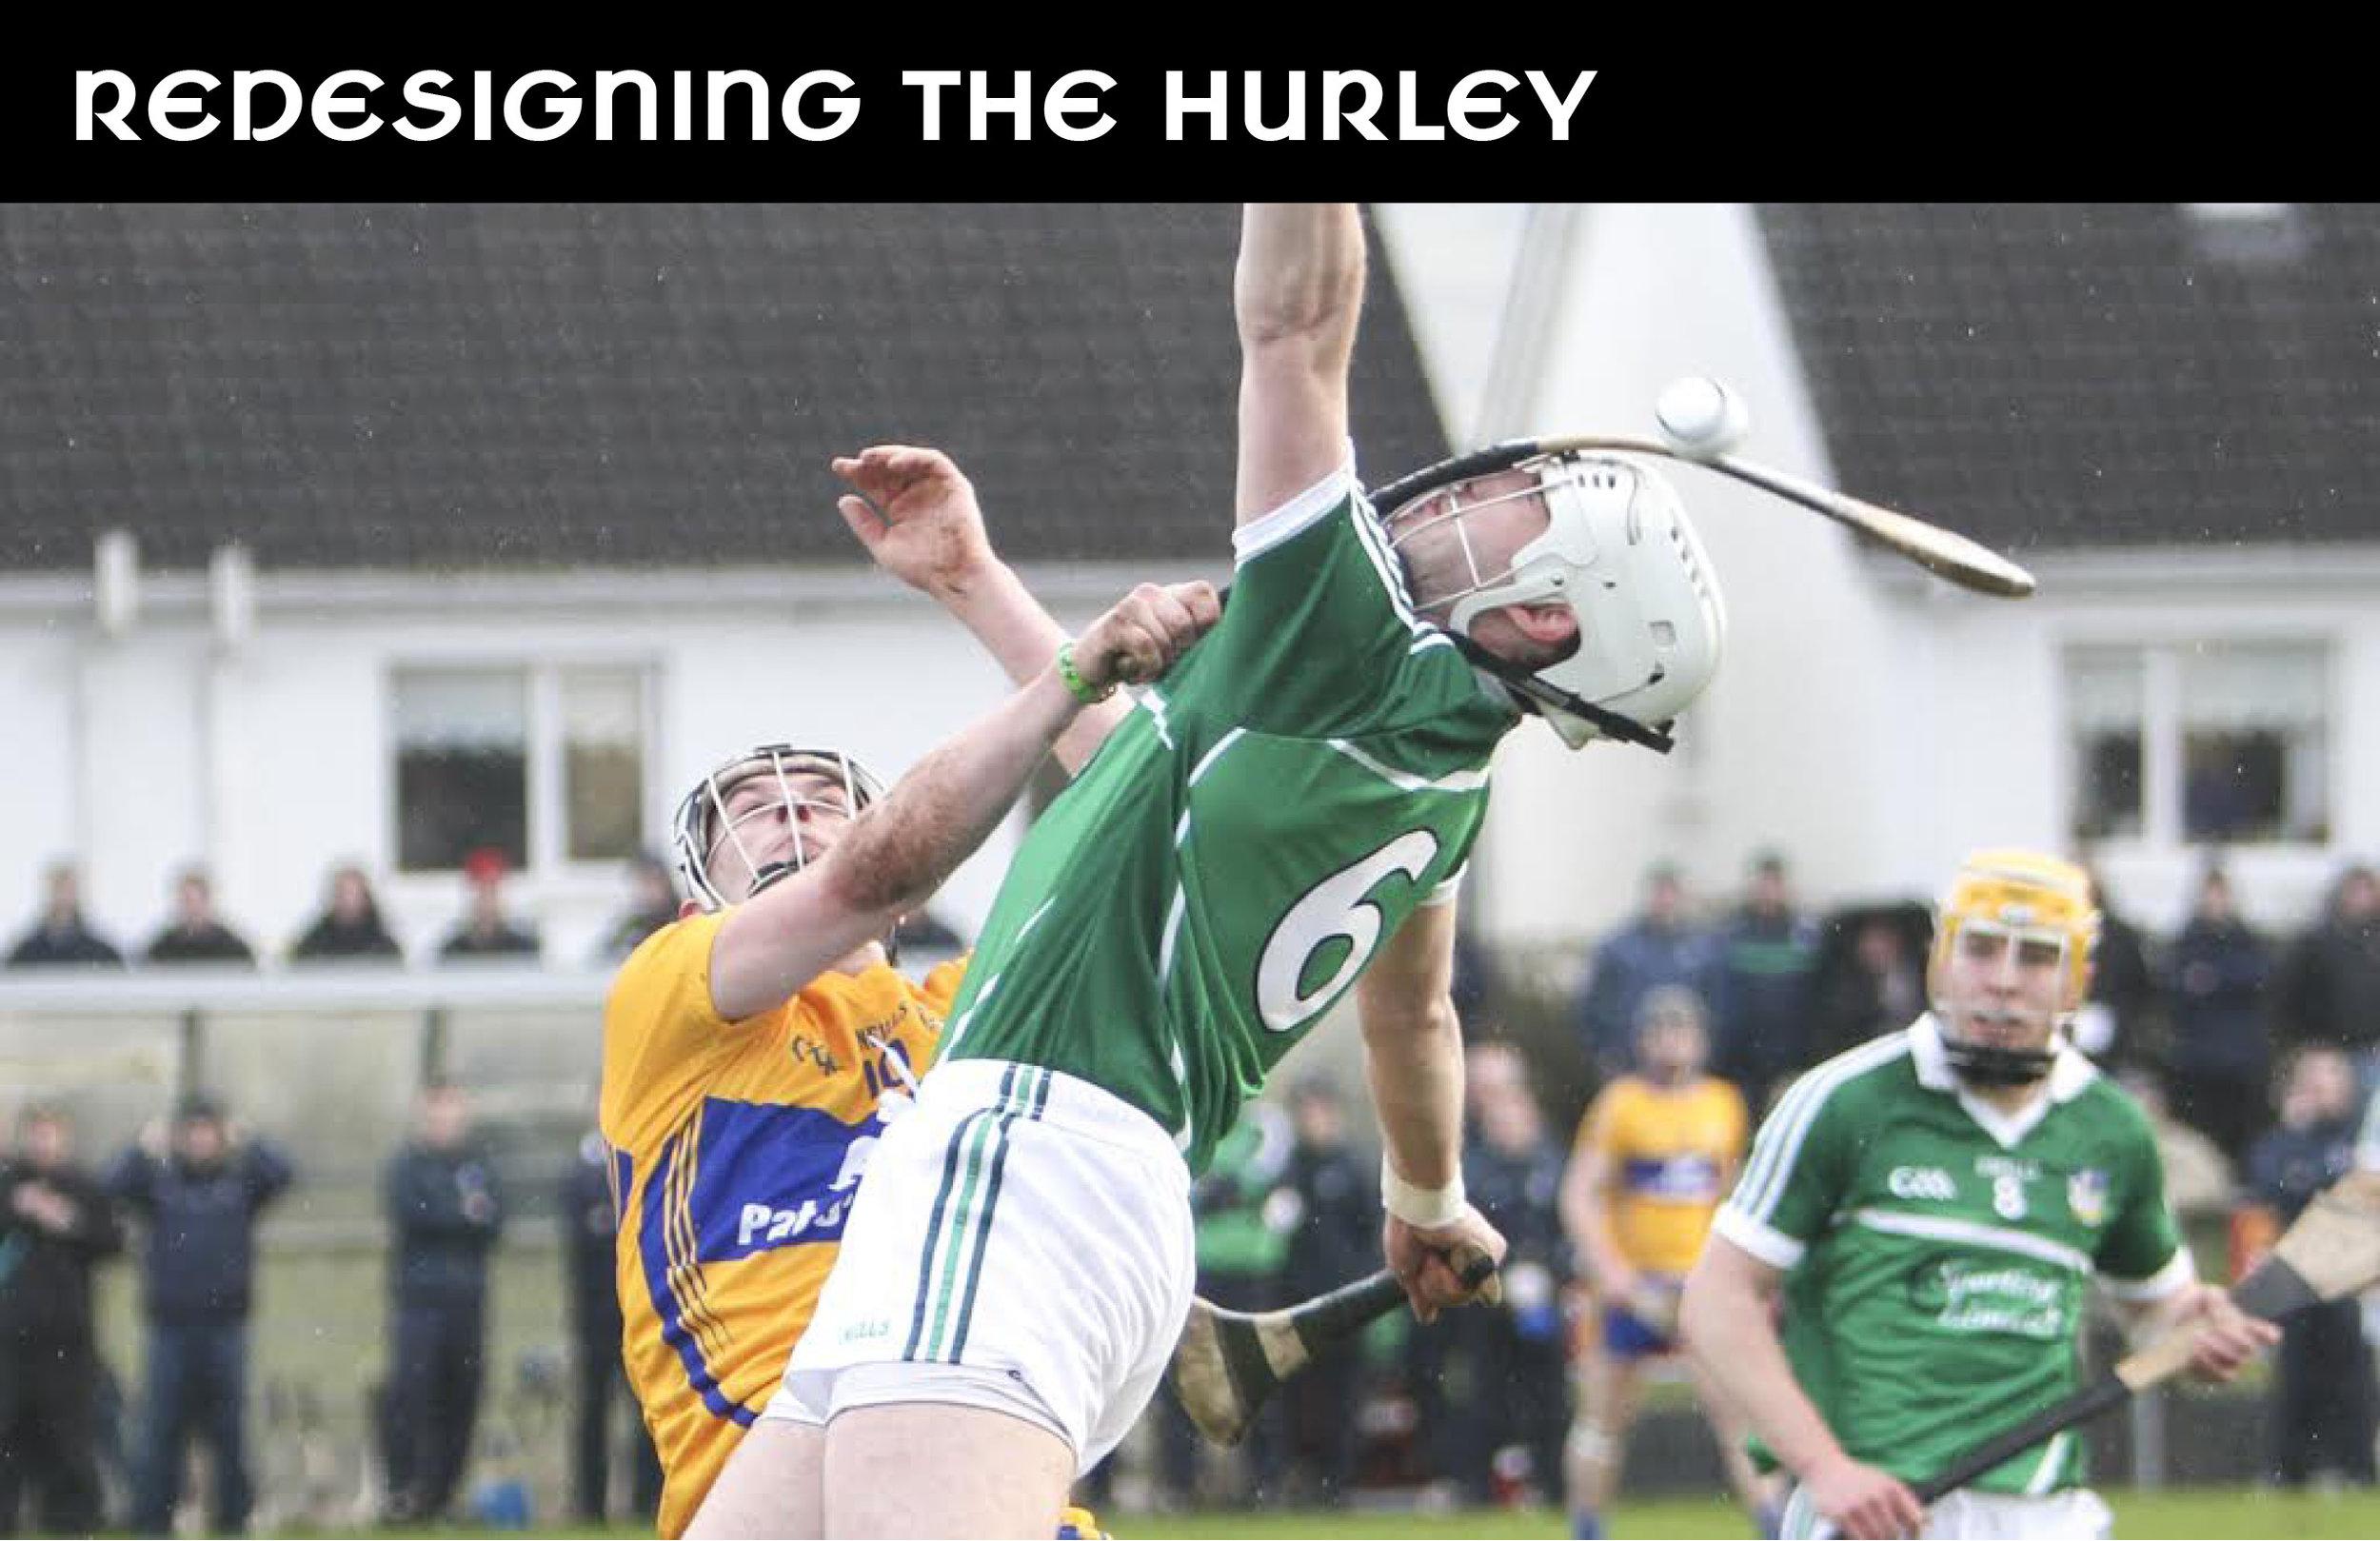 Hurley_redesign_01.jpg